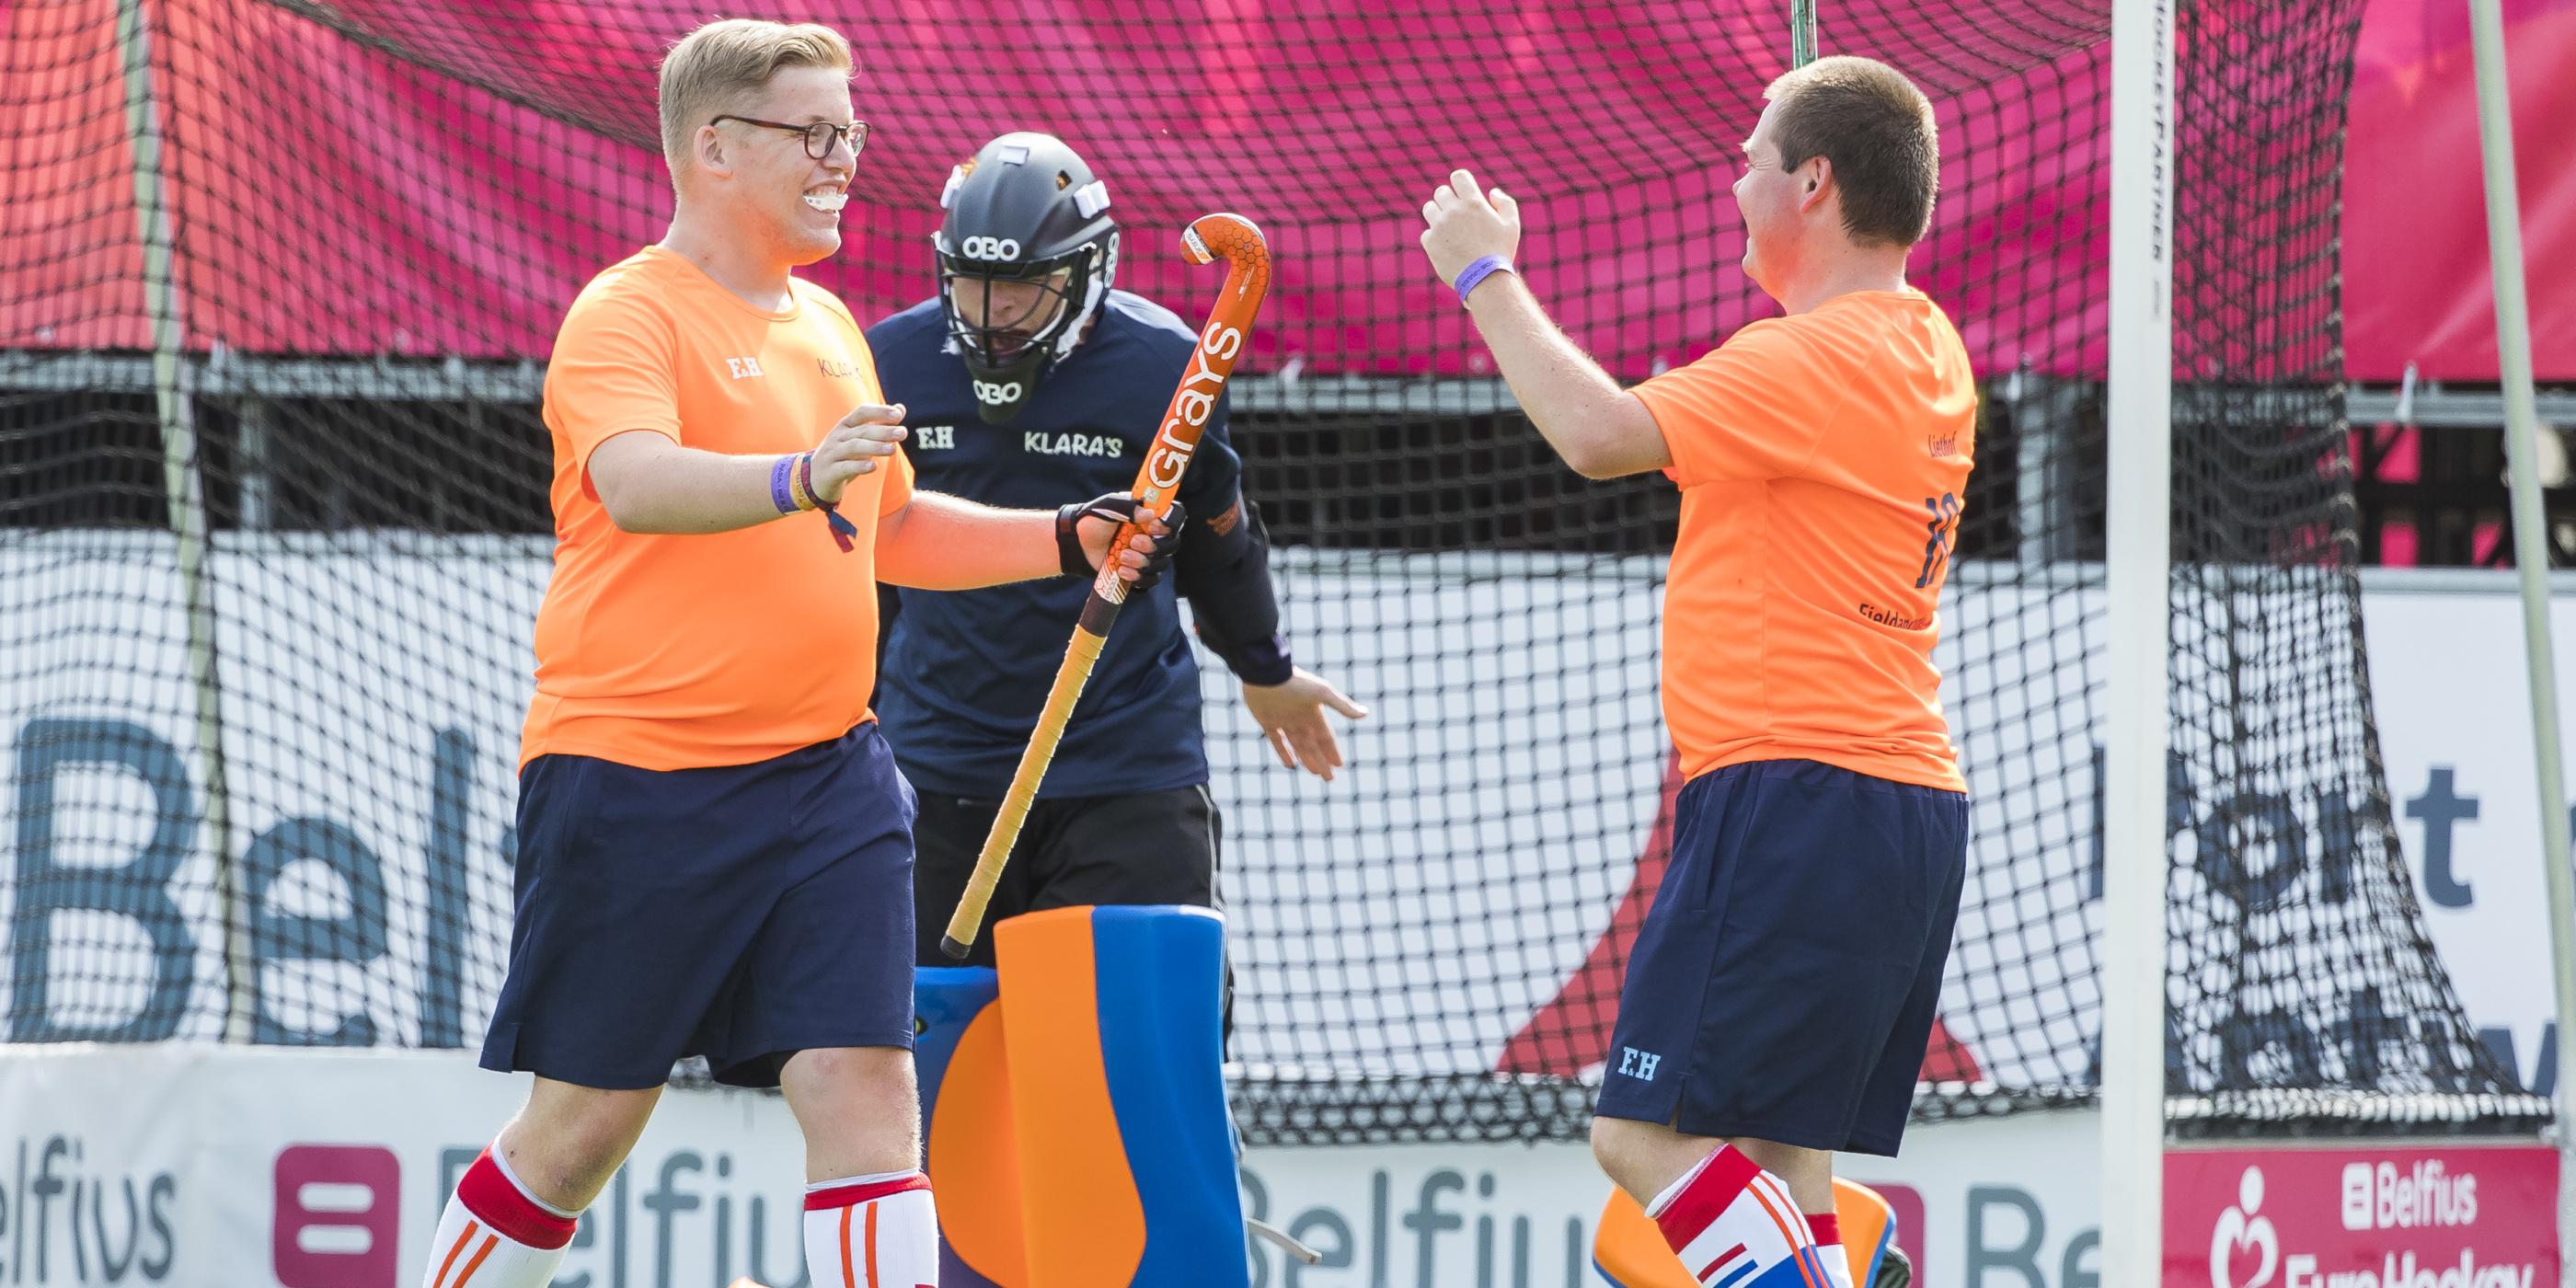 Special Olympics Invitational Field Hockey Tournament 2022 op velden DHC Drienerlo